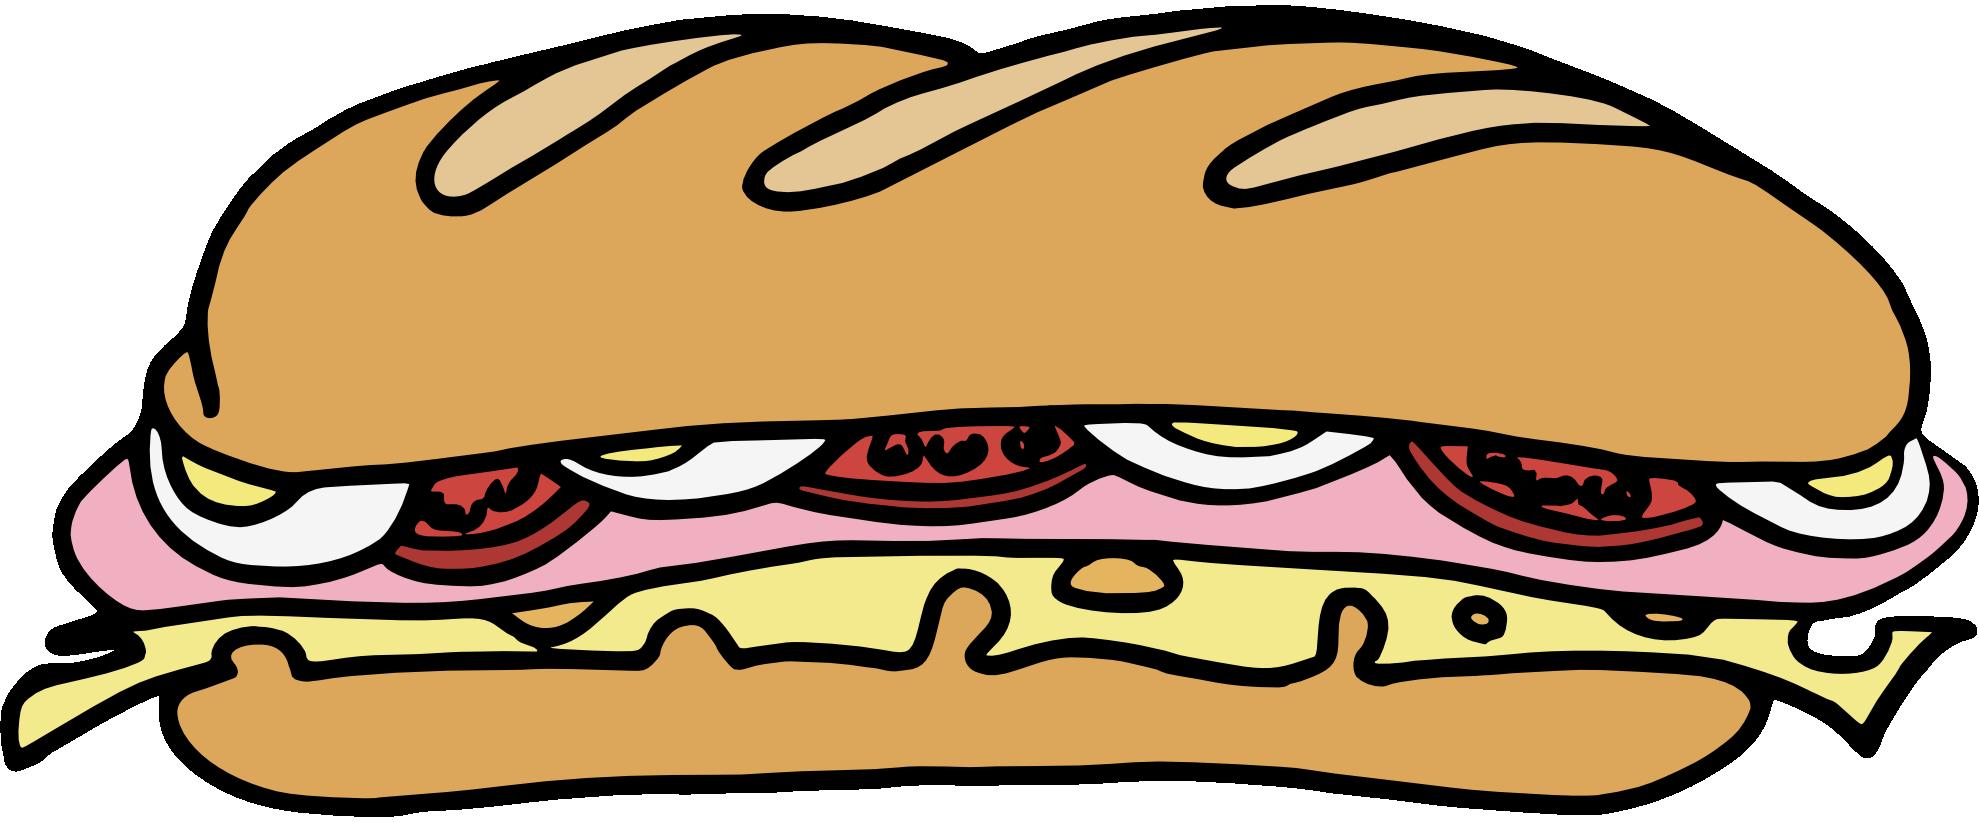 Cuba clipart ballroom dancing Sandwich%20clipart Clipart Sandwich Clip Free